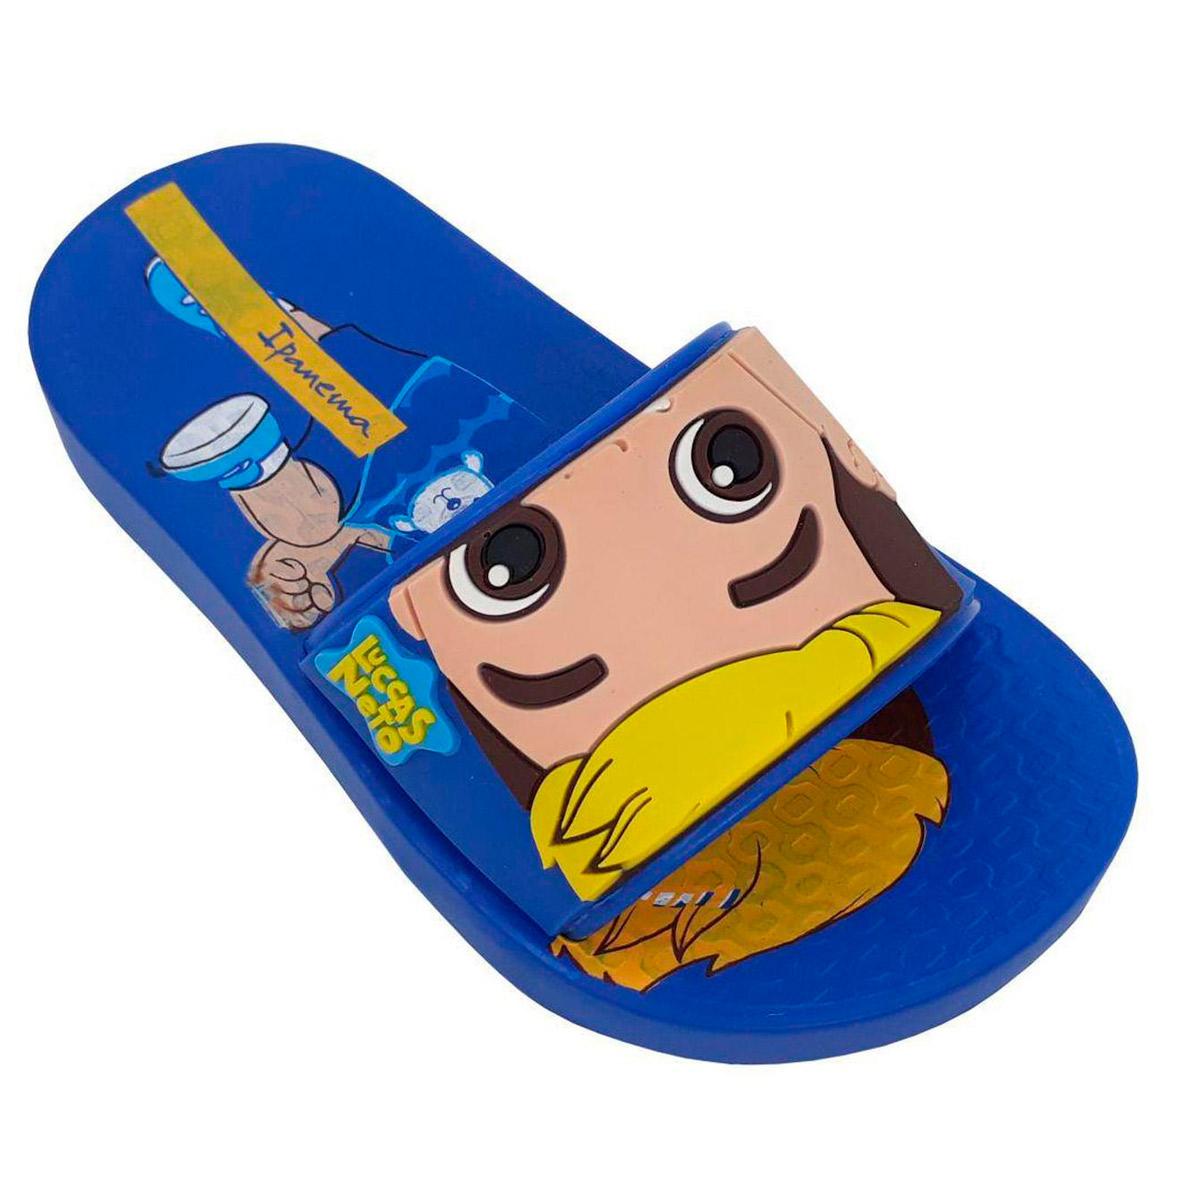 Chinelo Slide Masculino Infantil Ipanema Lucas Neto 26497